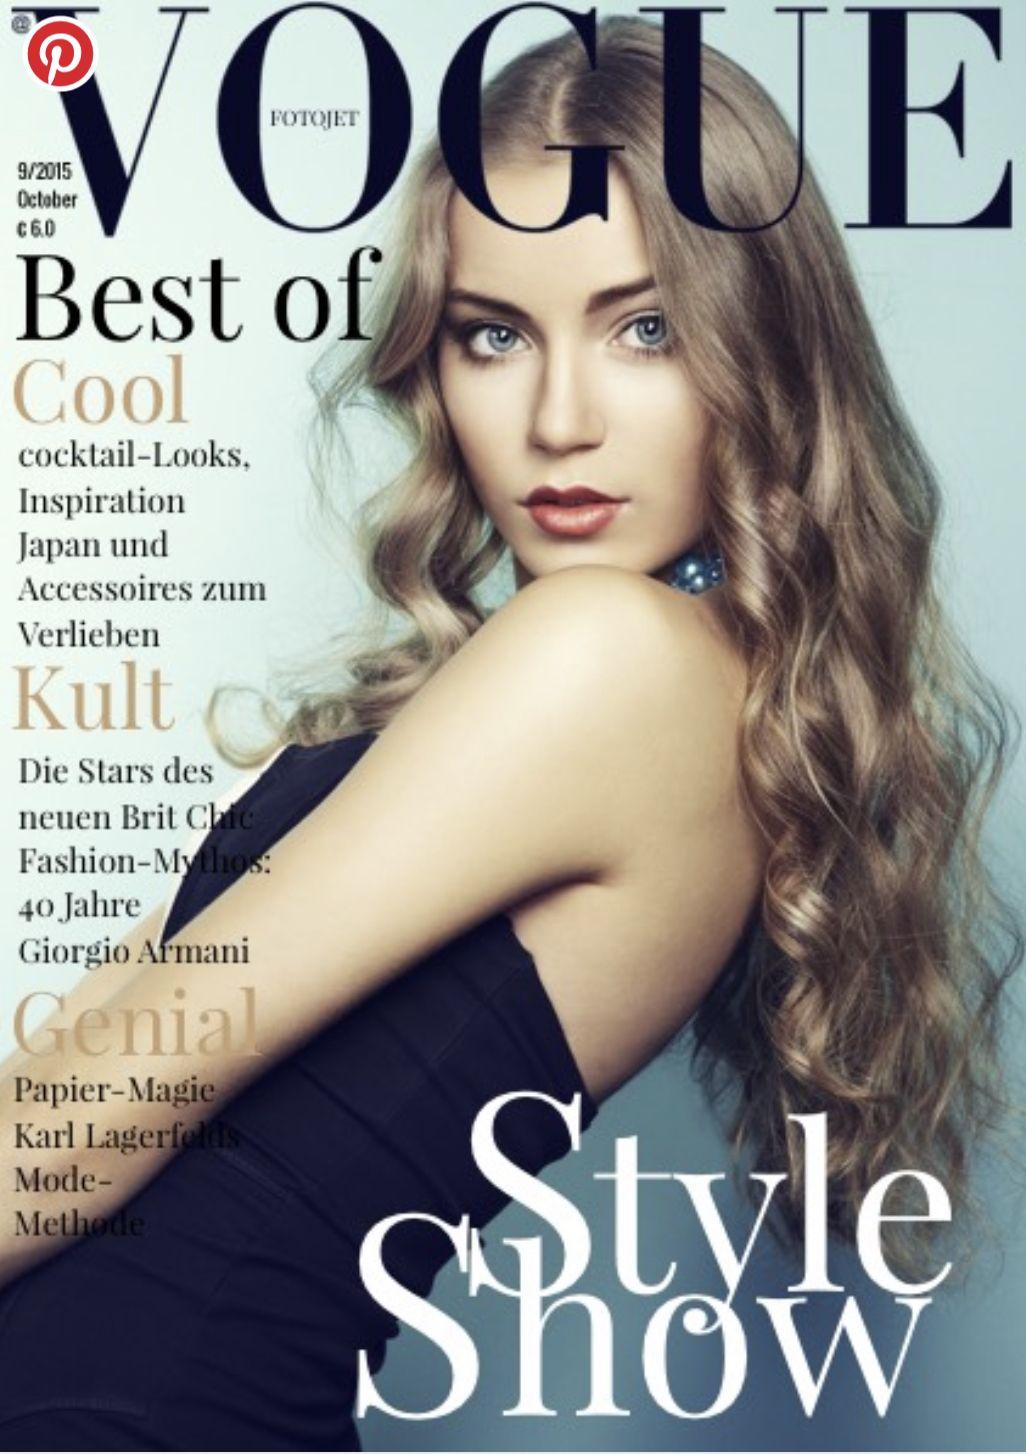 Vogue Magazine In 2020 Magazine Cover Template Vogue Magazine